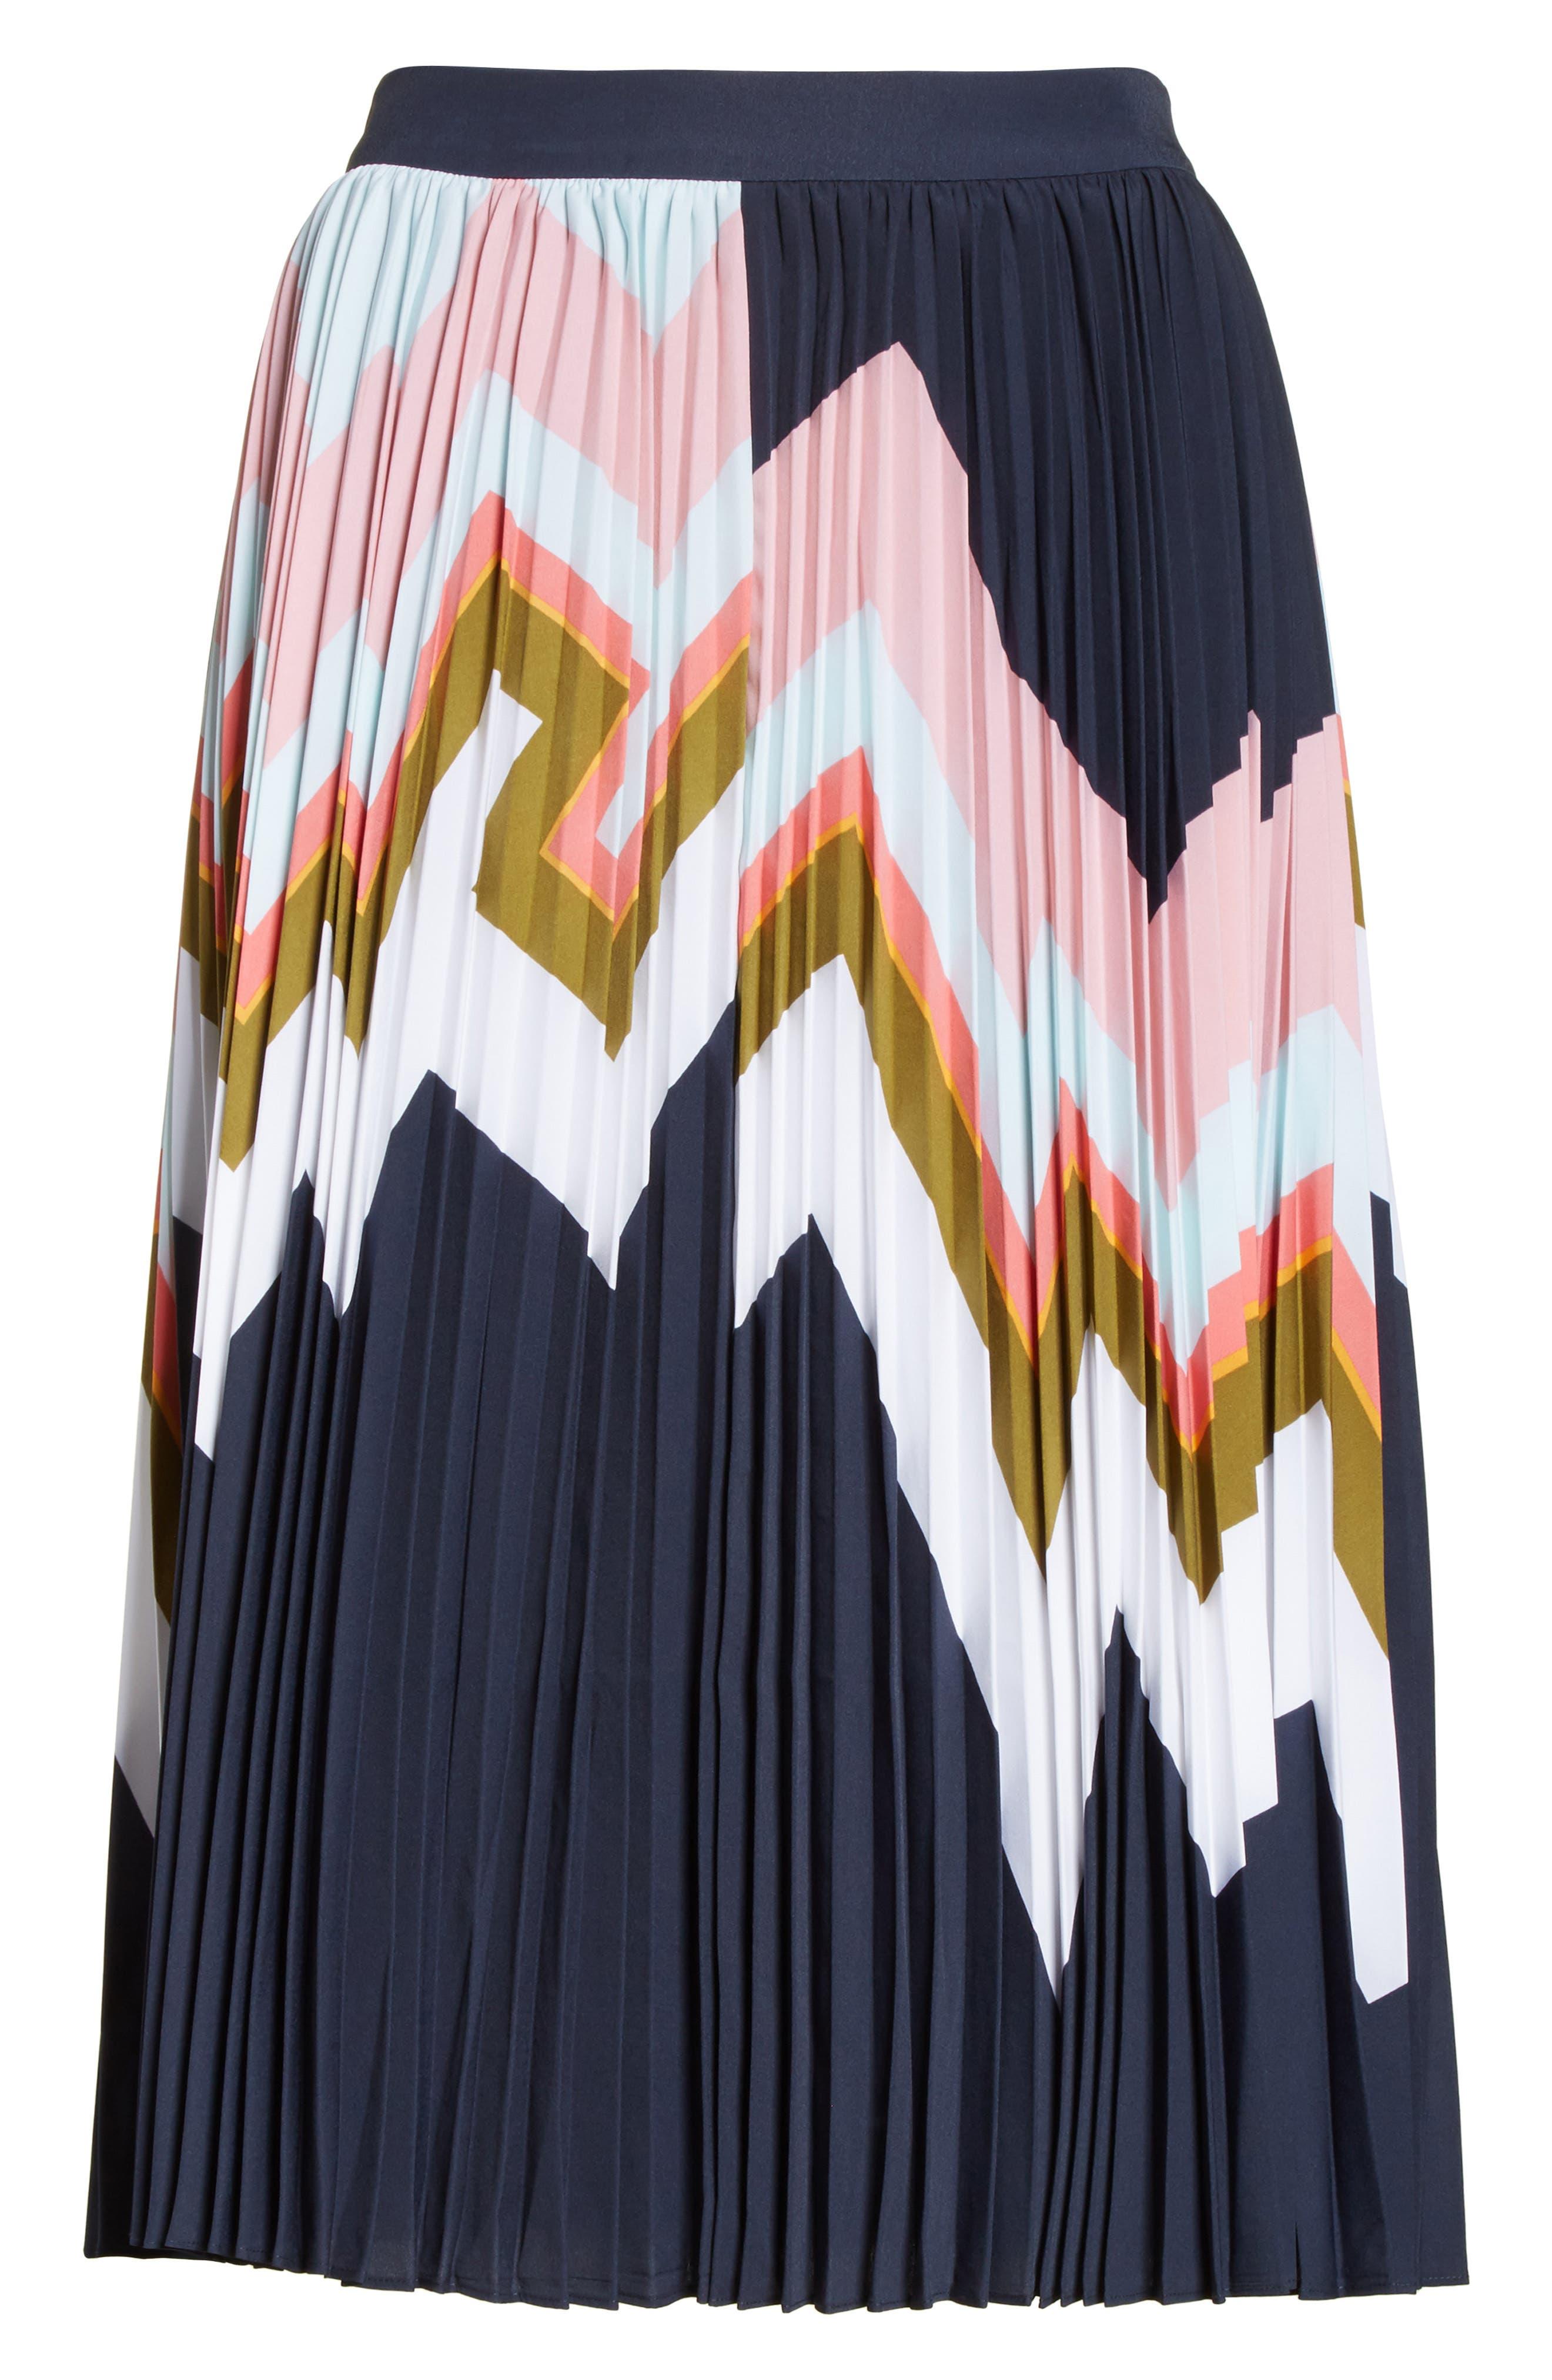 Evianna Mississippi Print Pleated Skirt,                             Alternate thumbnail 6, color,                             Navy